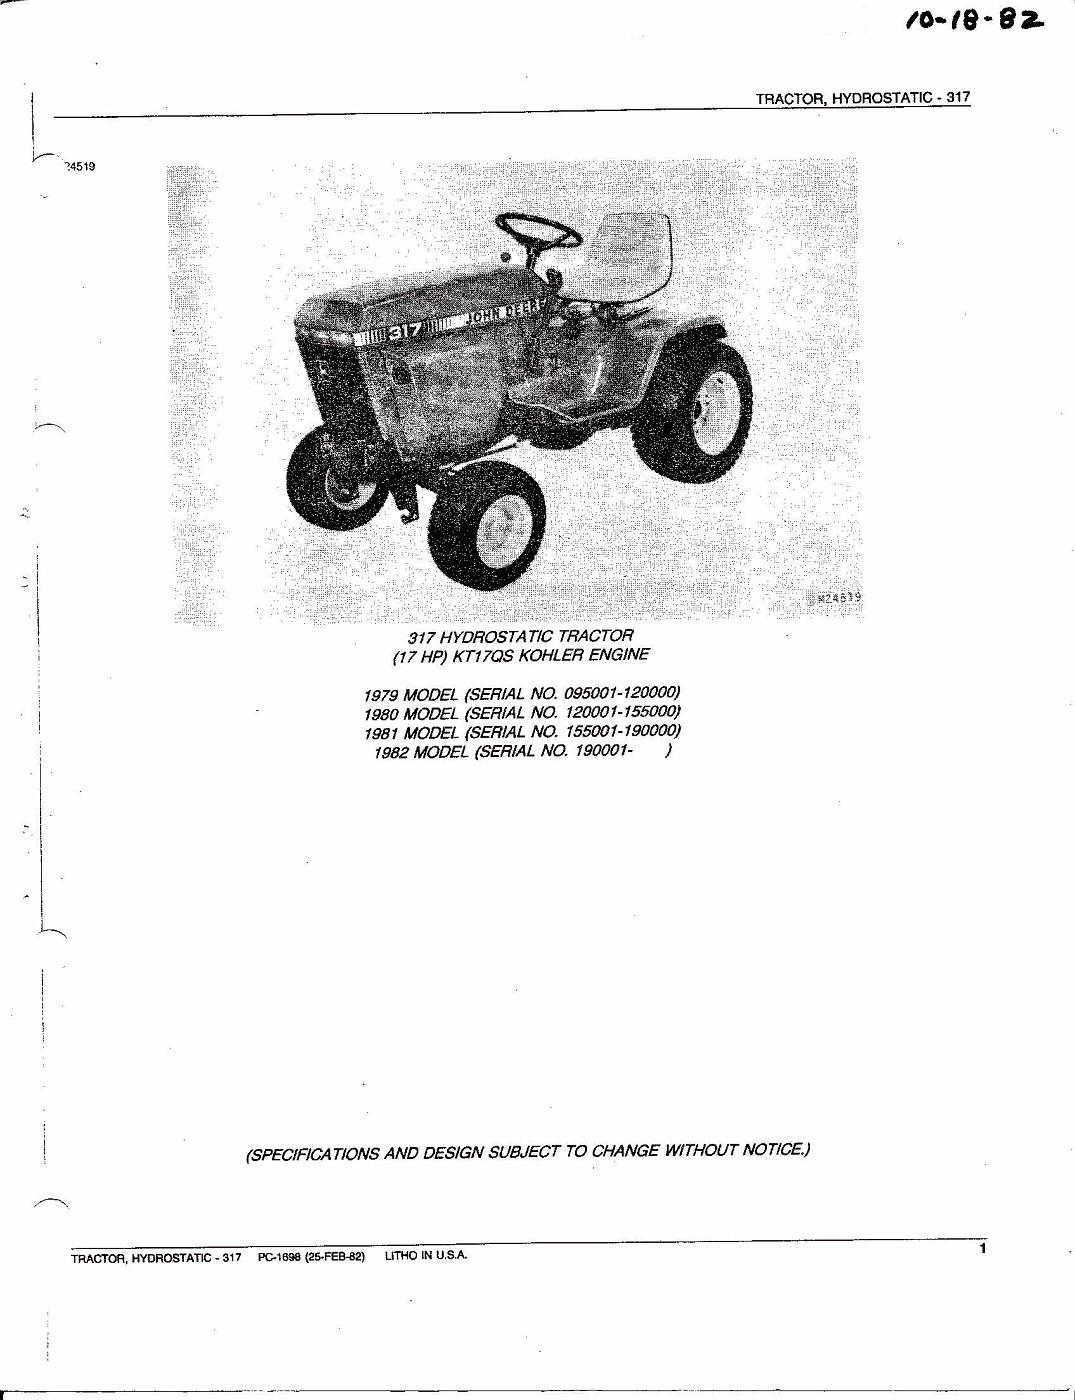 Tractor Parts Catalog : Photo john deere hydrostatic tractor parts catalog